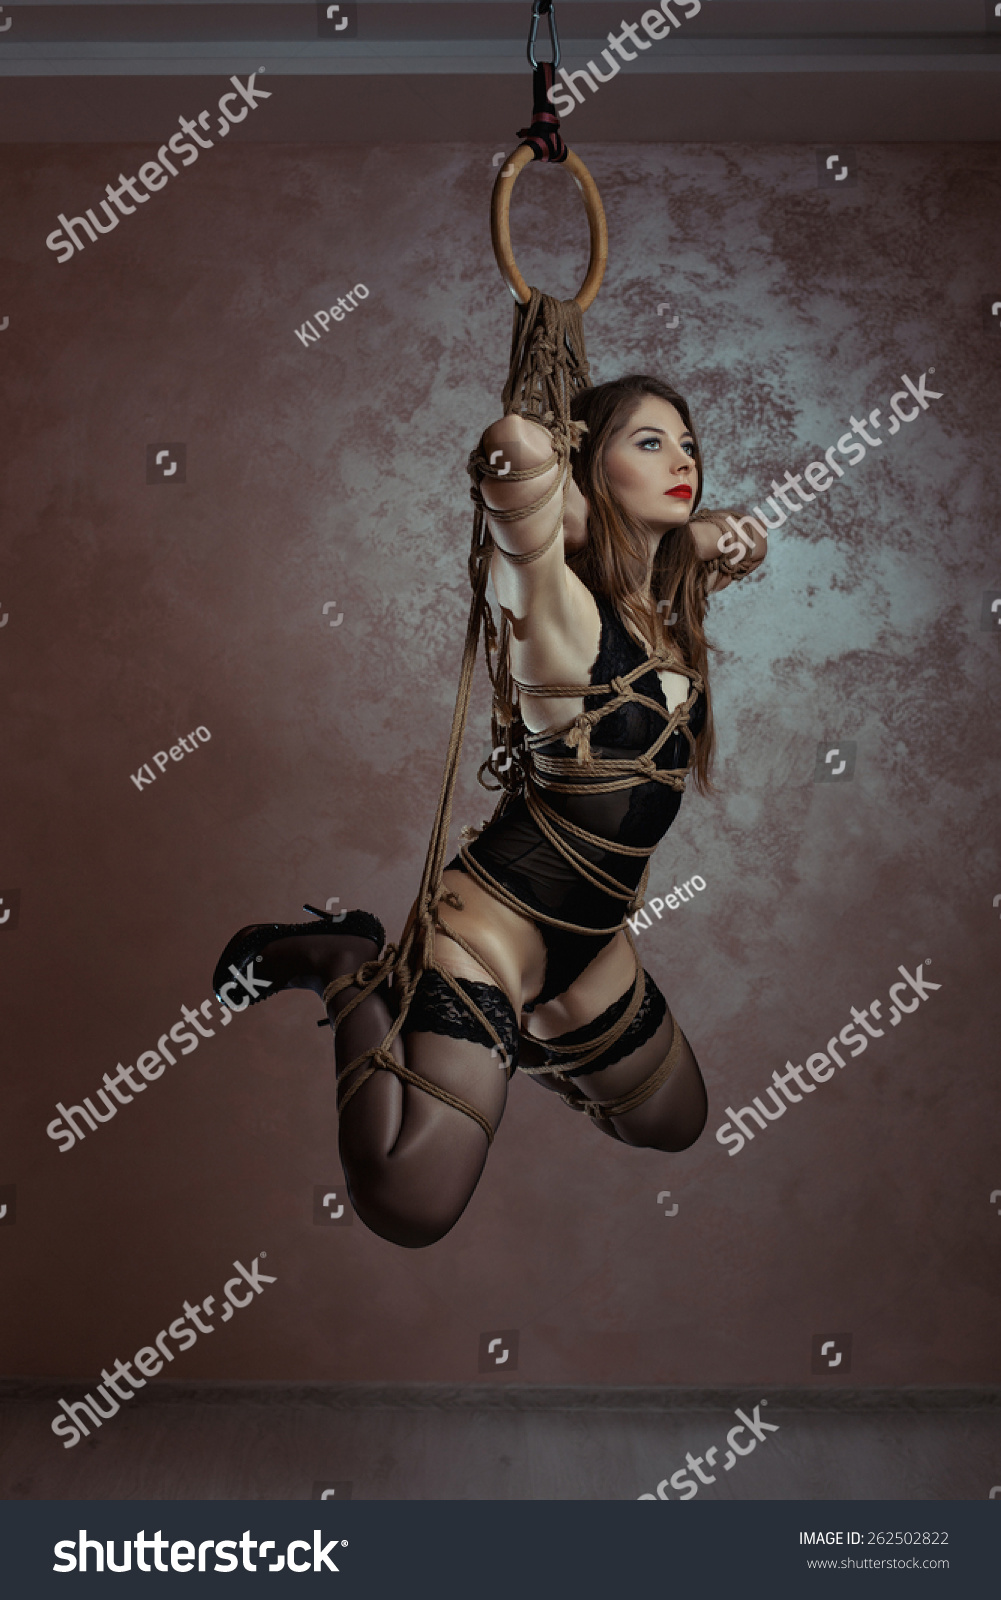 Suspended bondage pictures